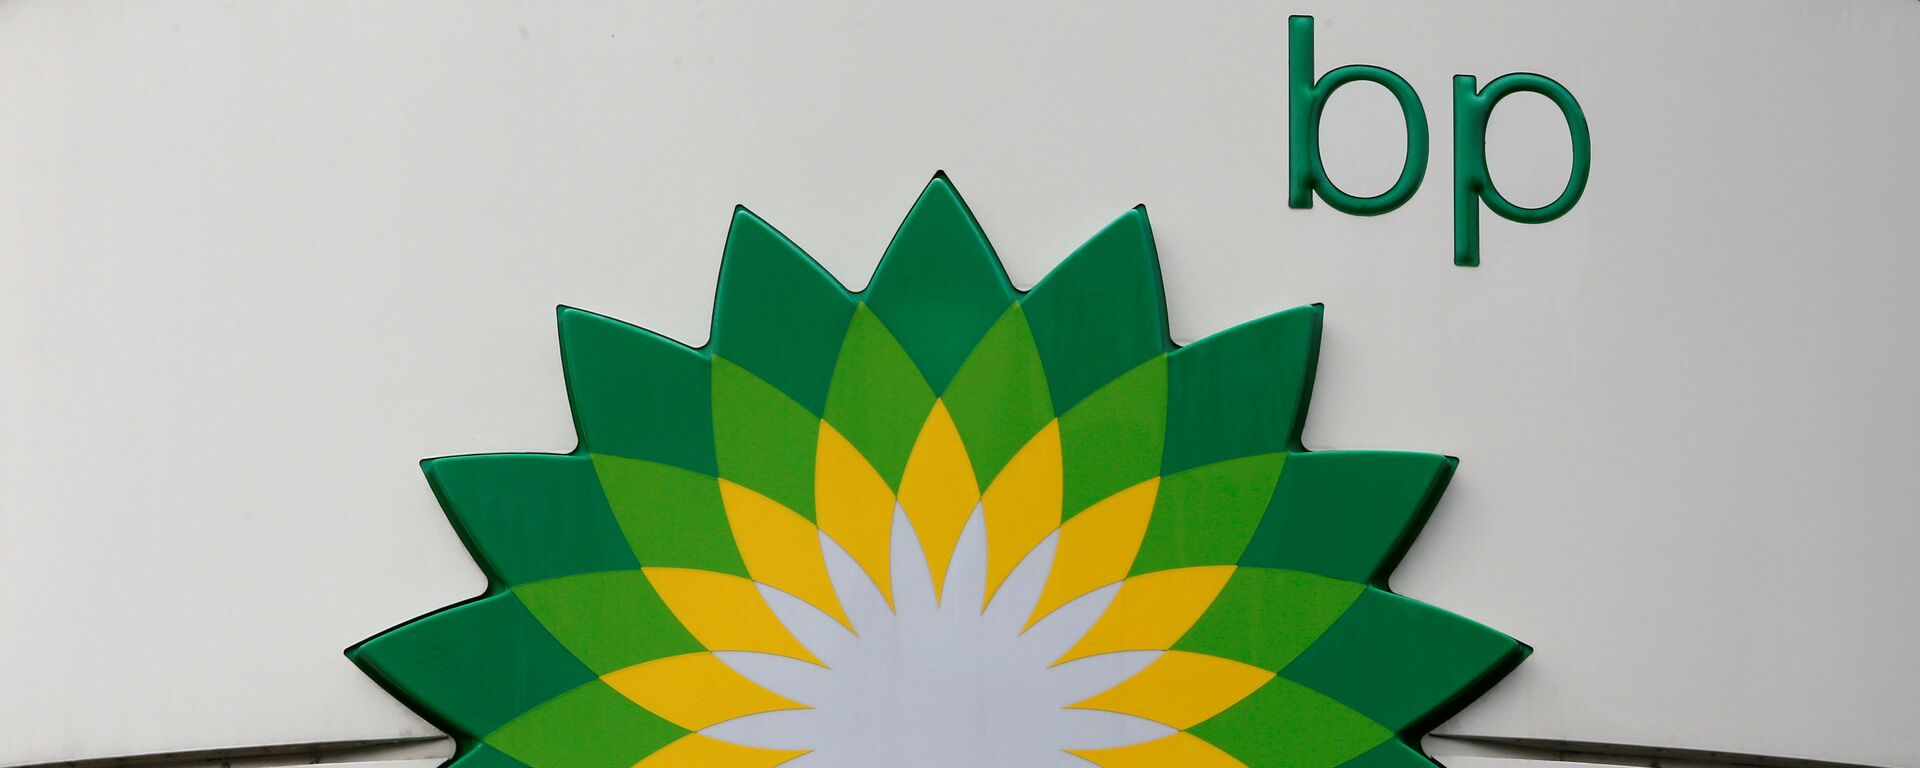 El logo de la compañía petrolera BP - Sputnik Mundo, 1920, 01.10.2021